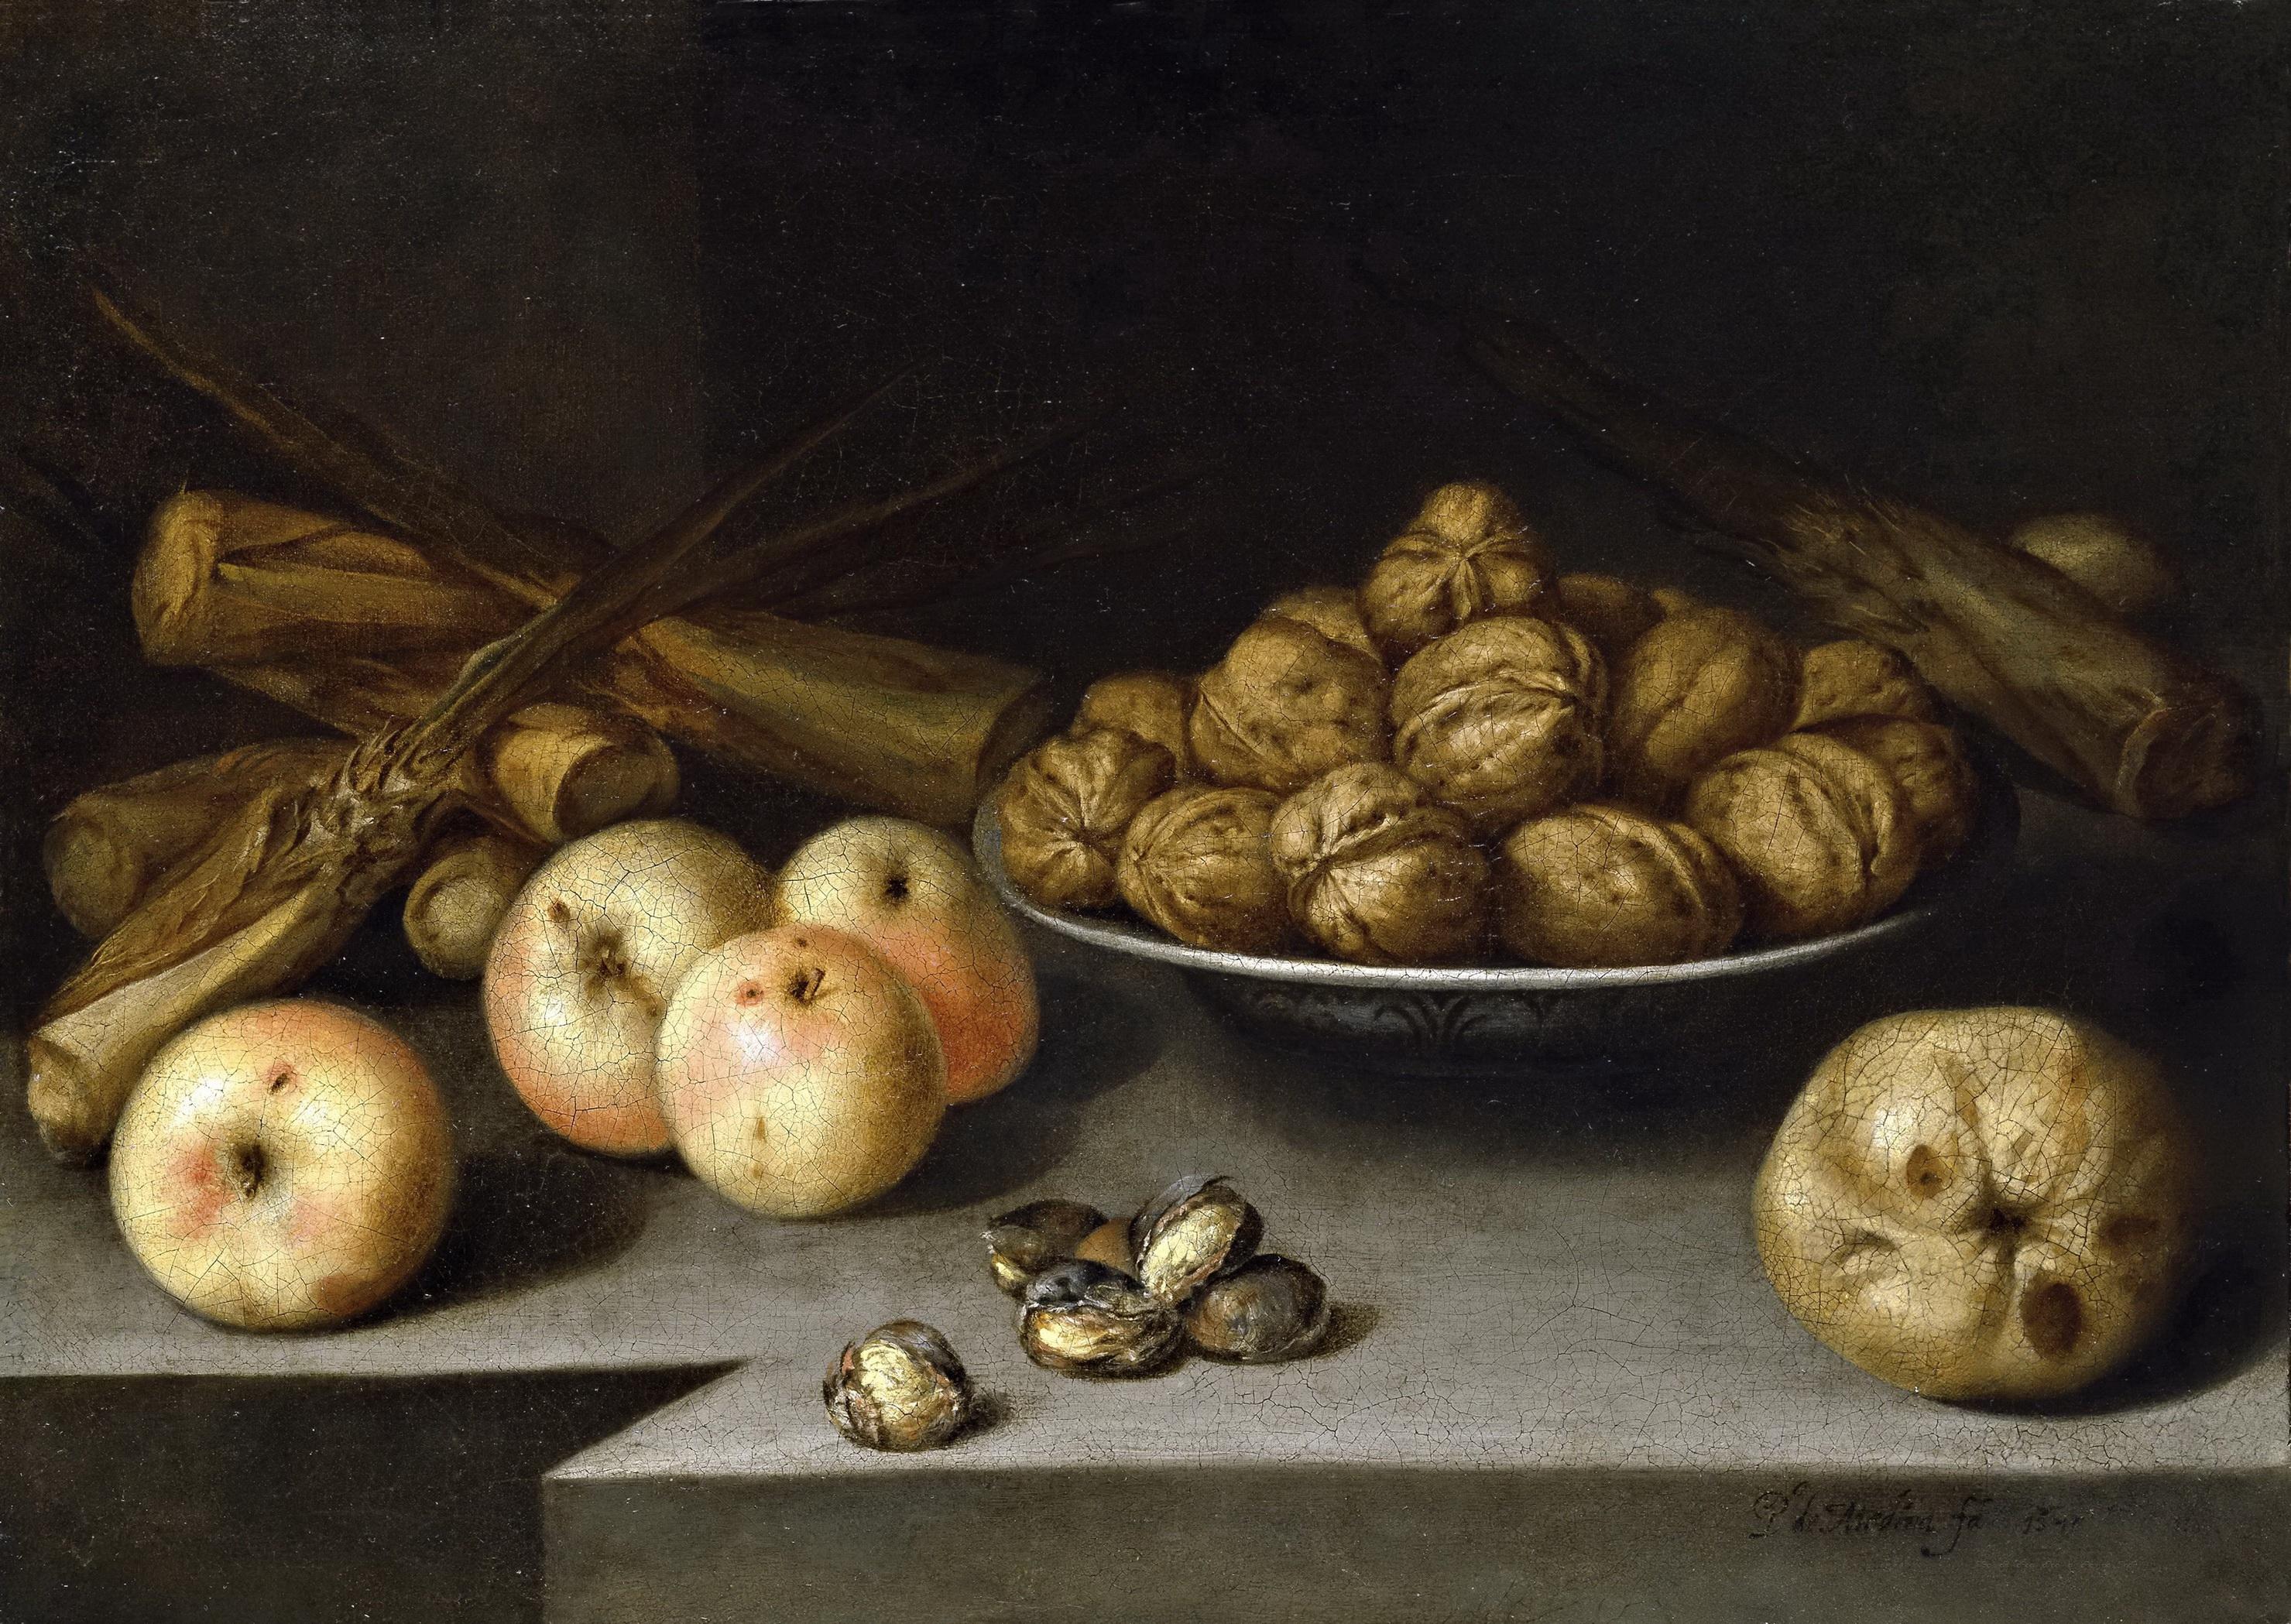 Медина, Педро де -- Натюрморт с яблоками, орехами и пластинами из сахарного тростника